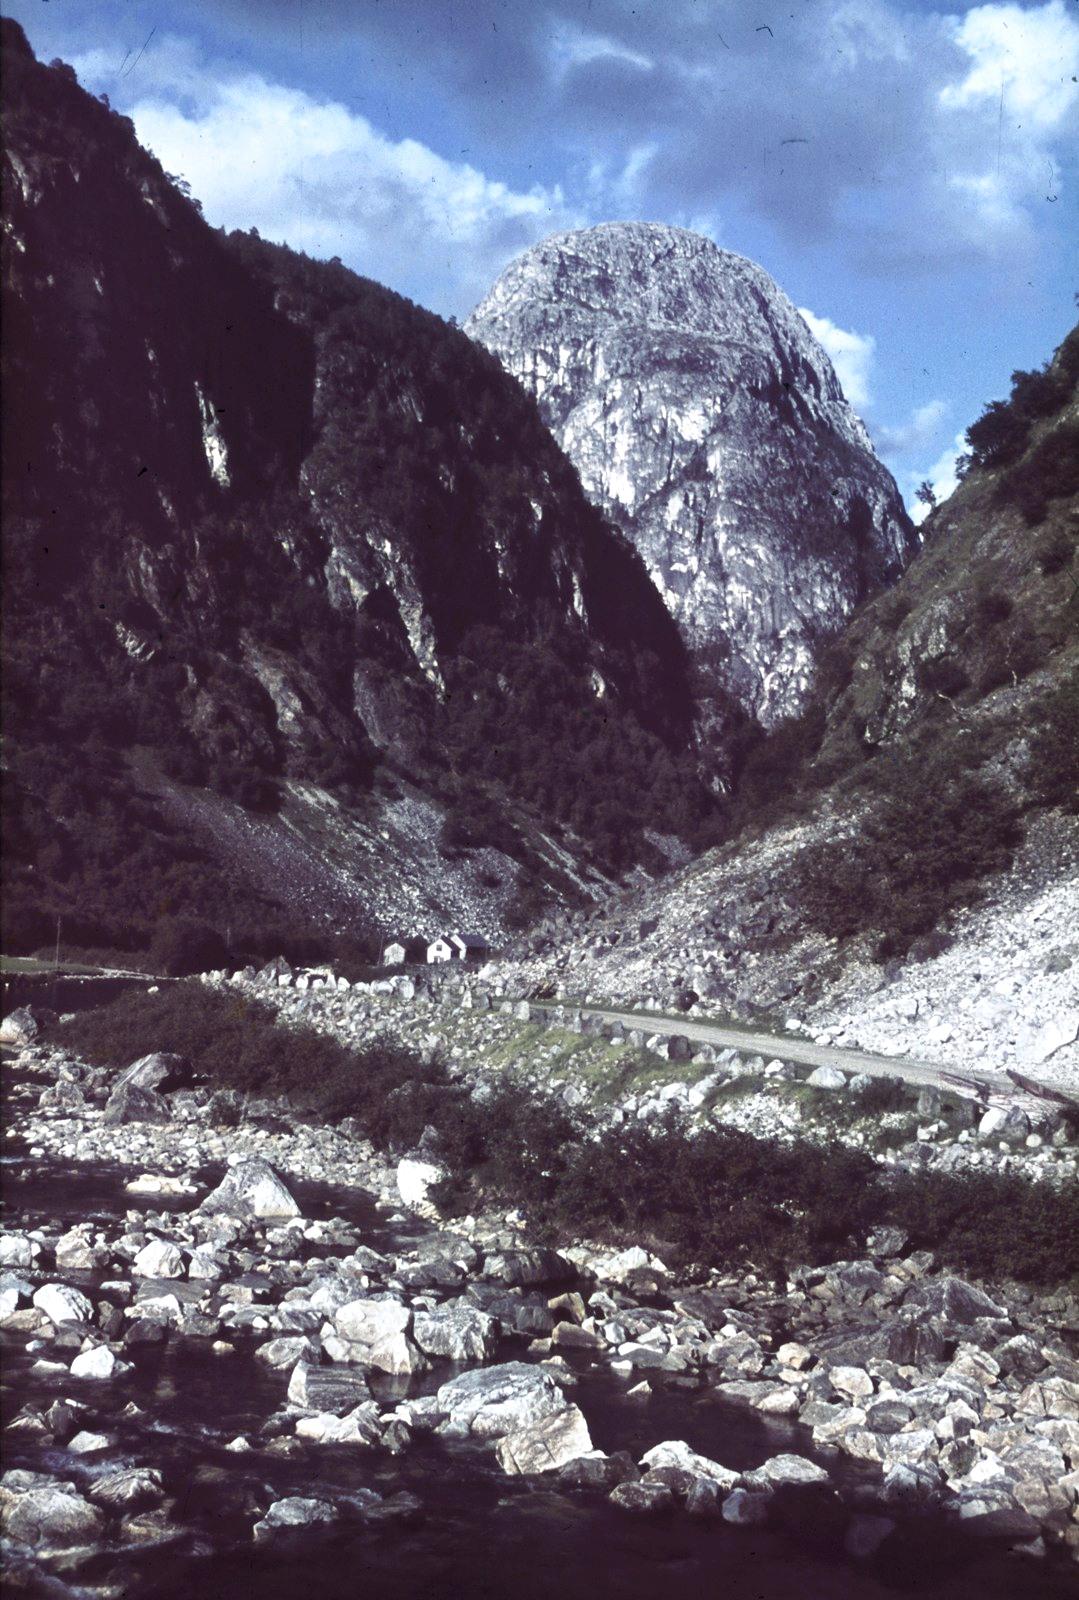 Сталхейм. Вид на Нарёдал (Нэрёйтал) с Хордальшнутом (слева)